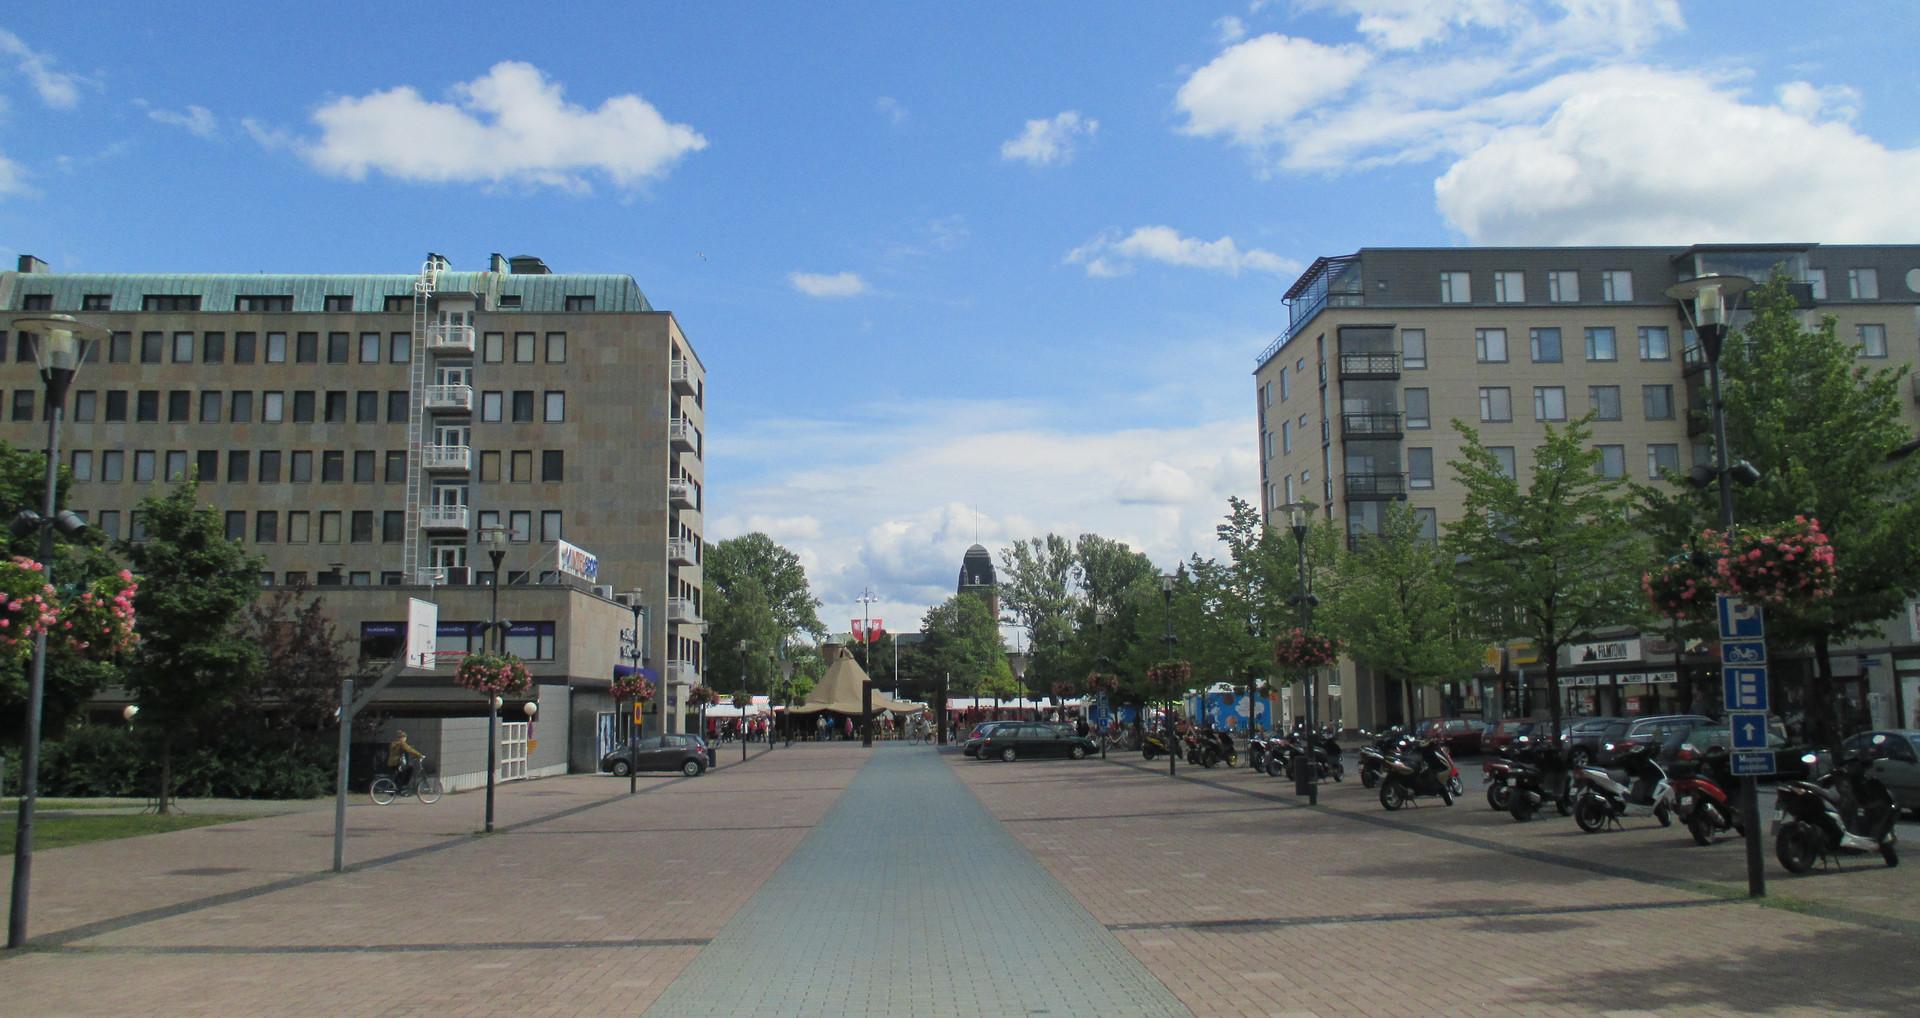 Experiencia en Joensuu, Finlandia por Saeedeh